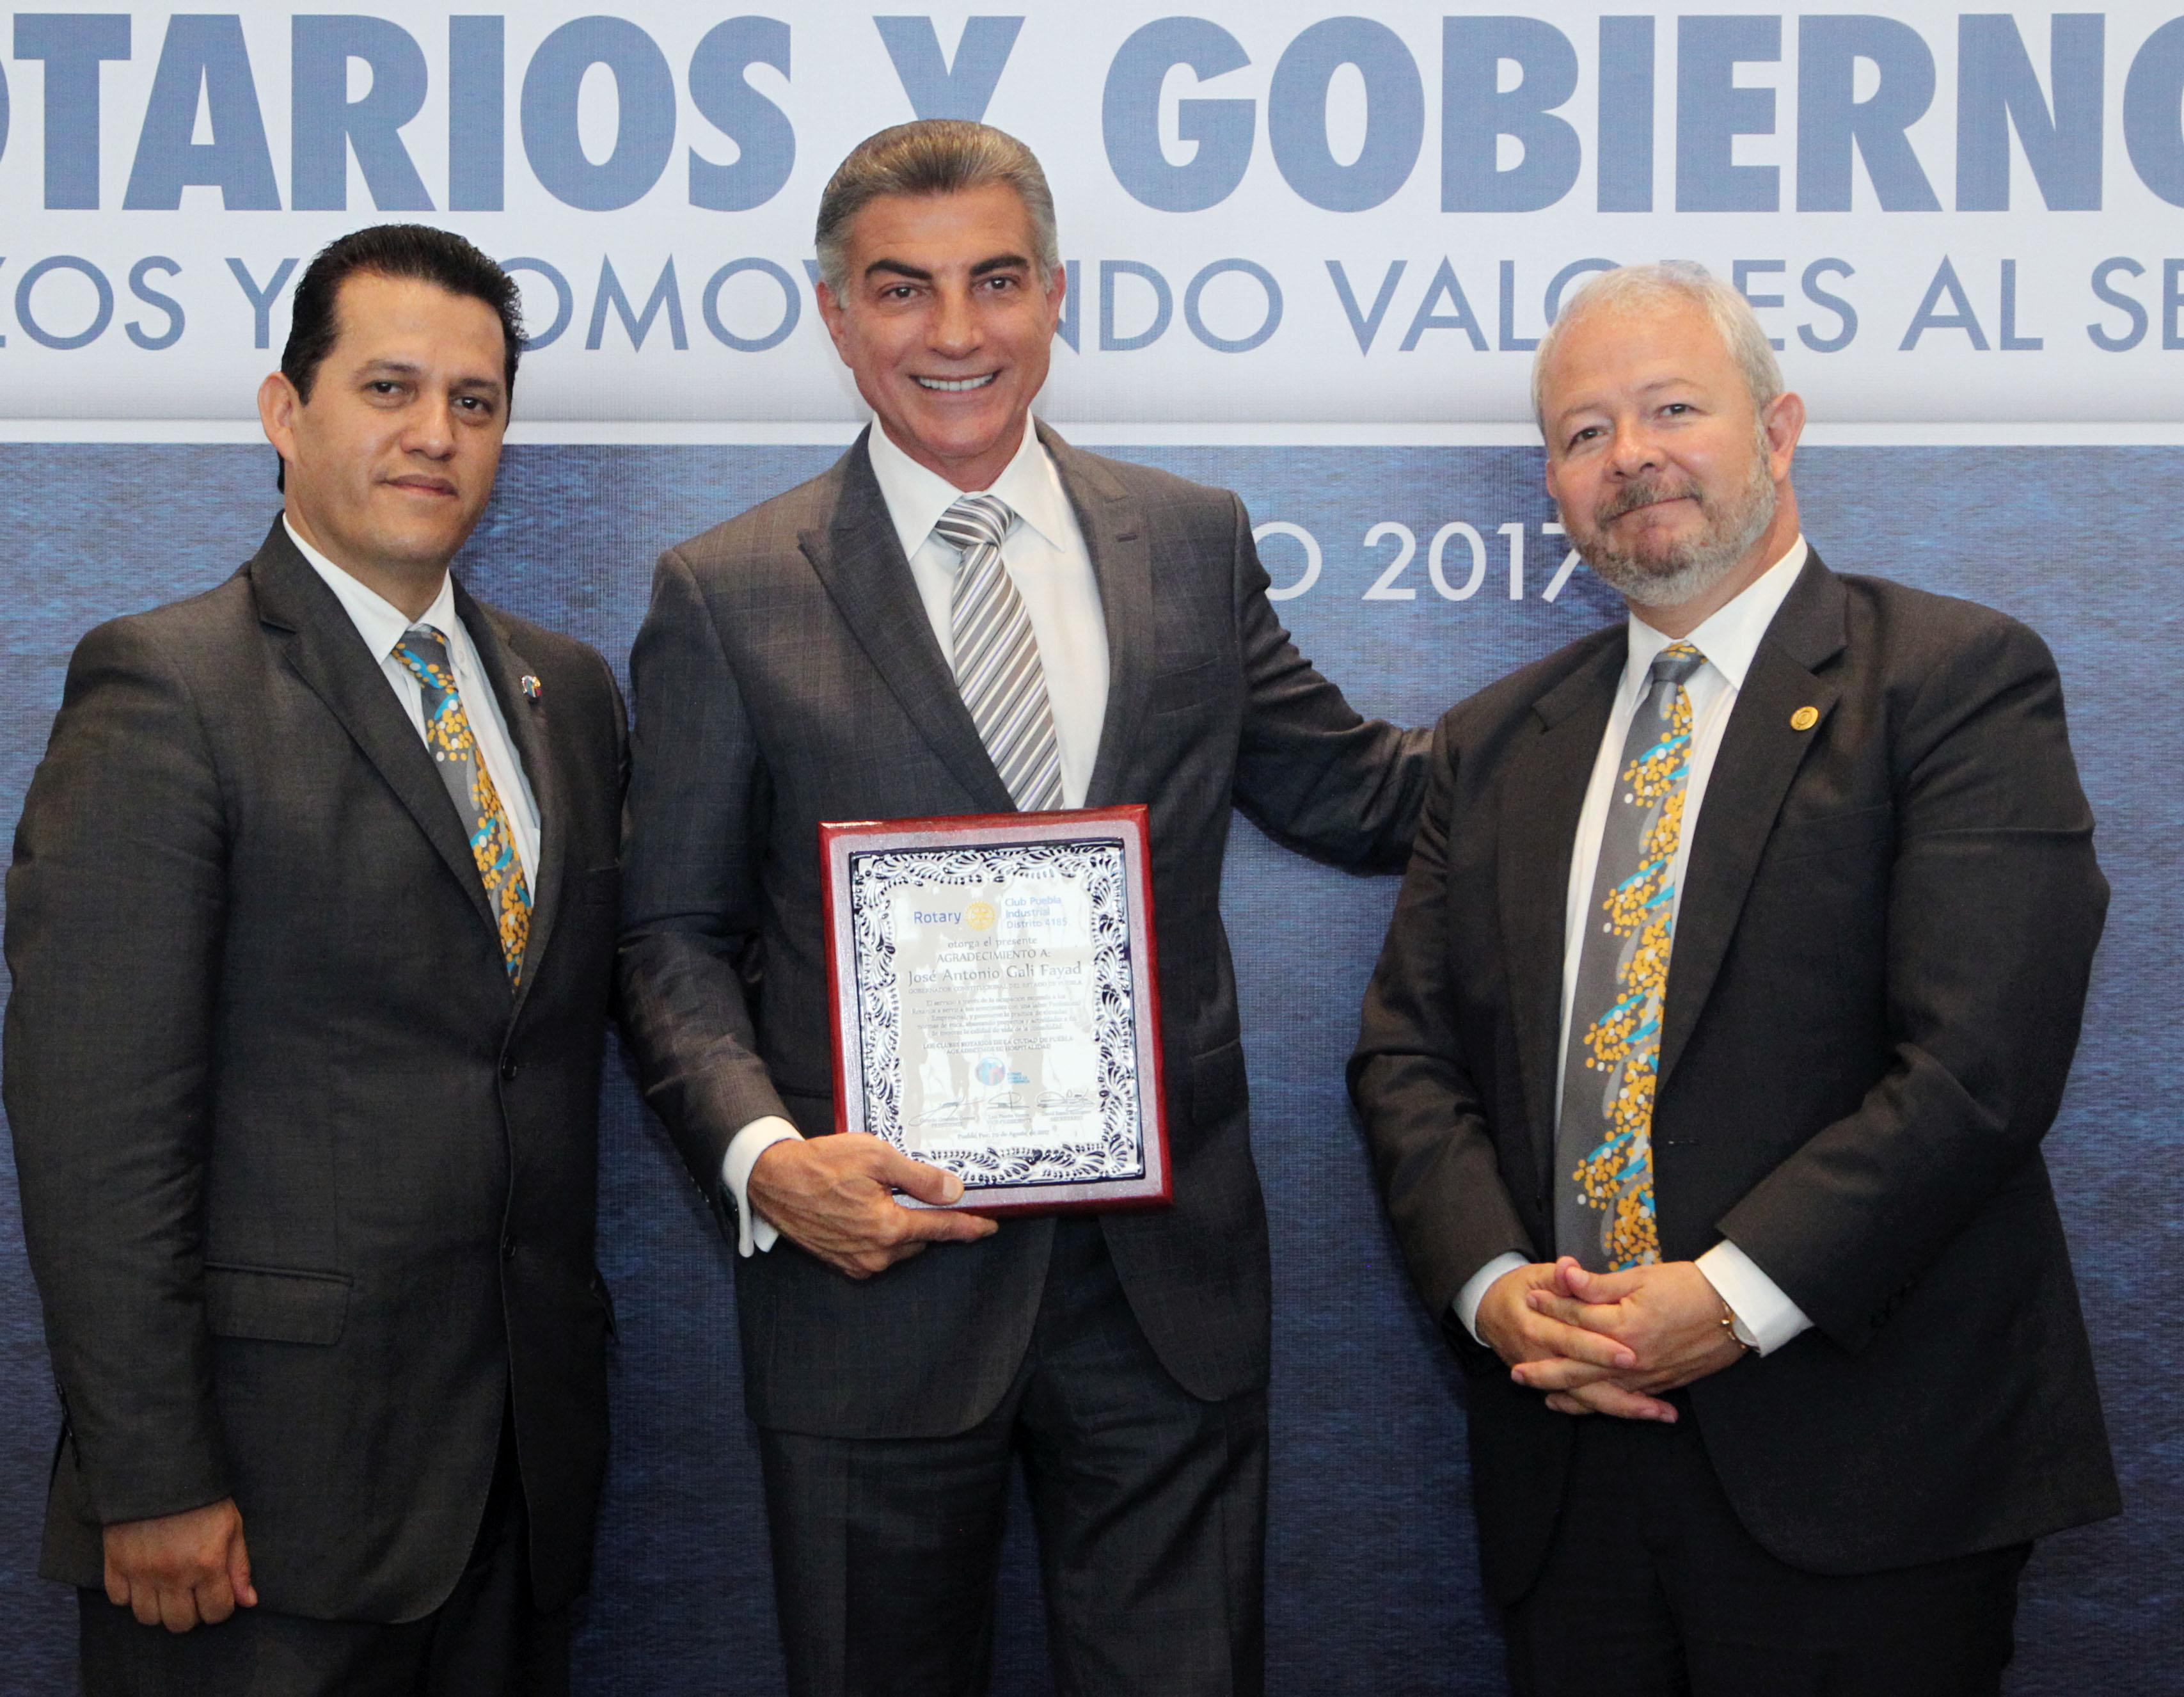 Gali suma esfuerzos con Rotarios para promover valores